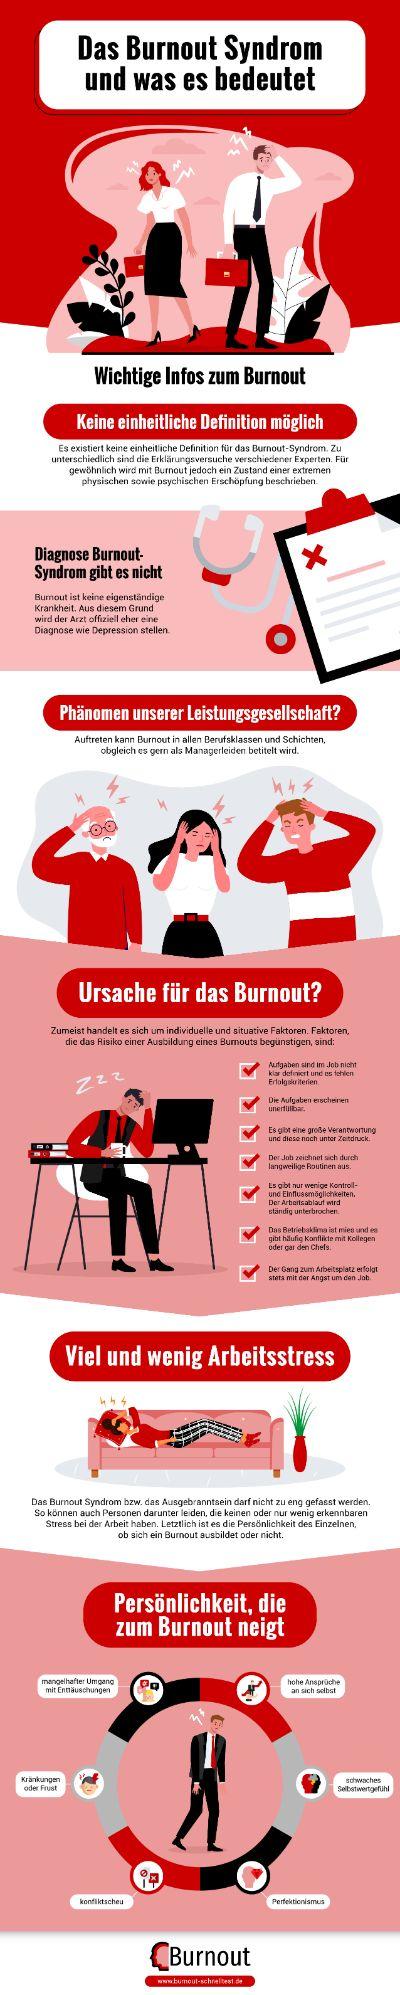 Infografik Das Burnout Syndrom